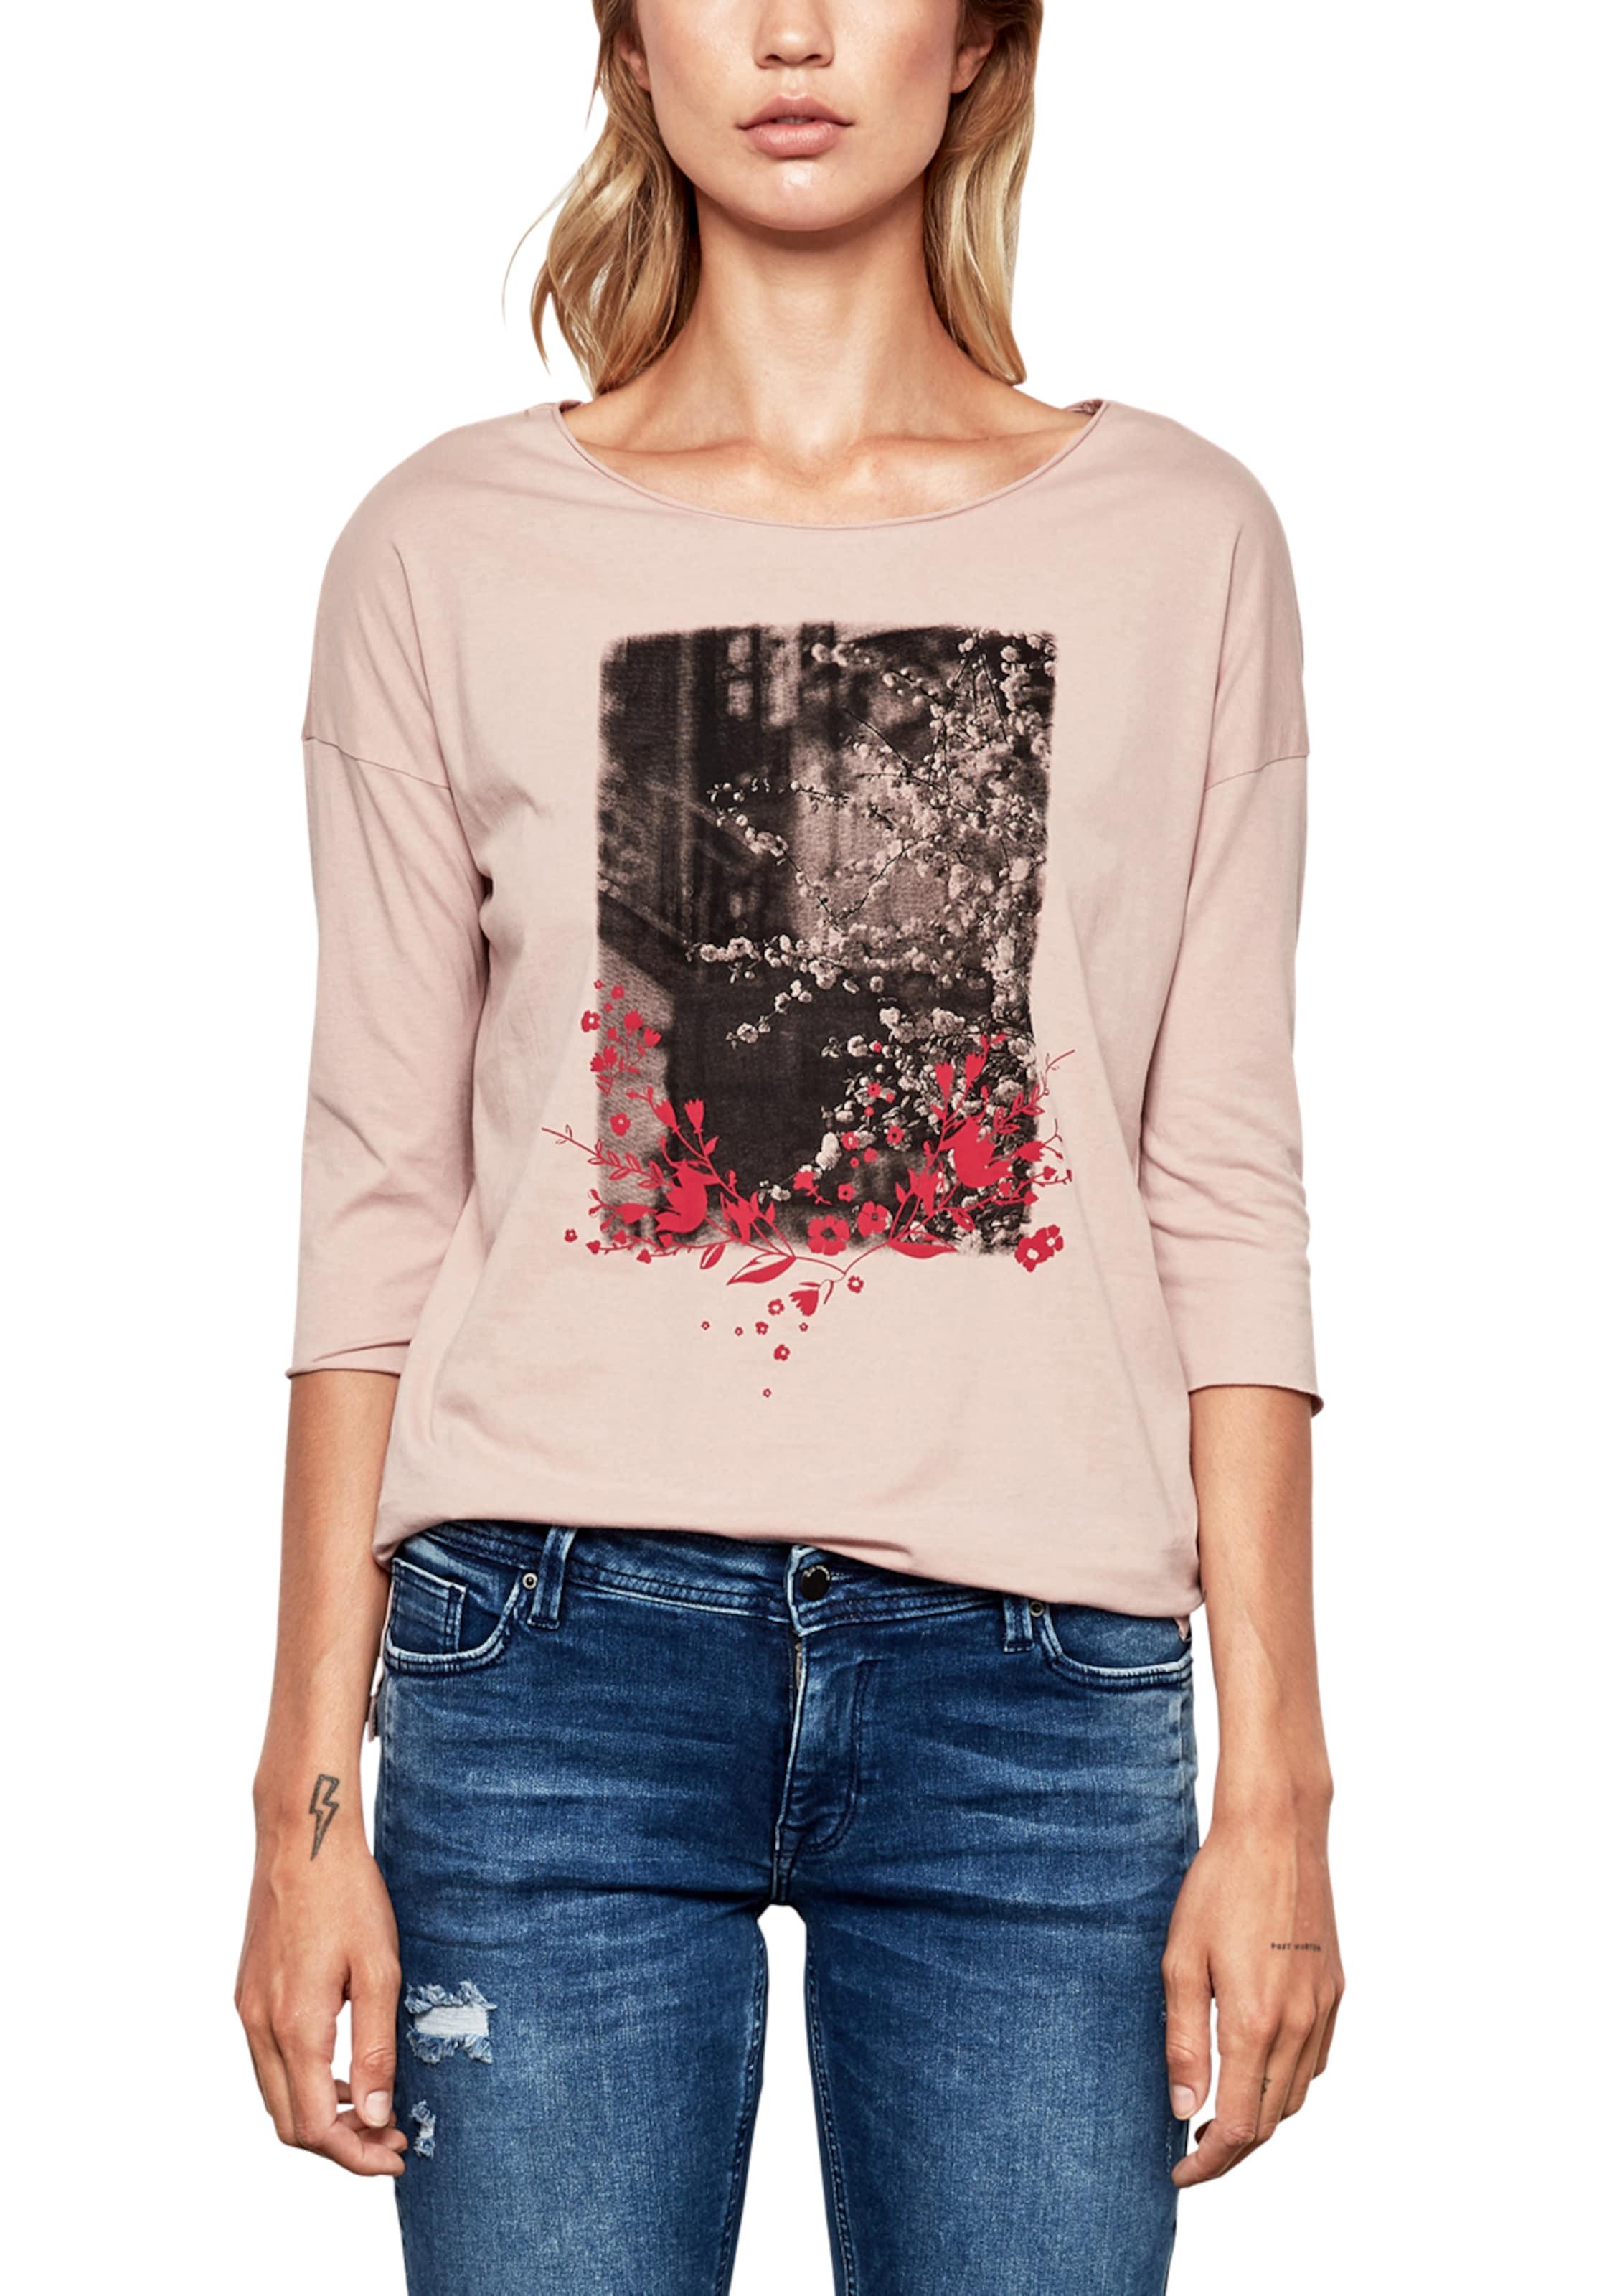 By Designed Q s RosaRot Shirt Schwarz In 4Lq35RAcjS